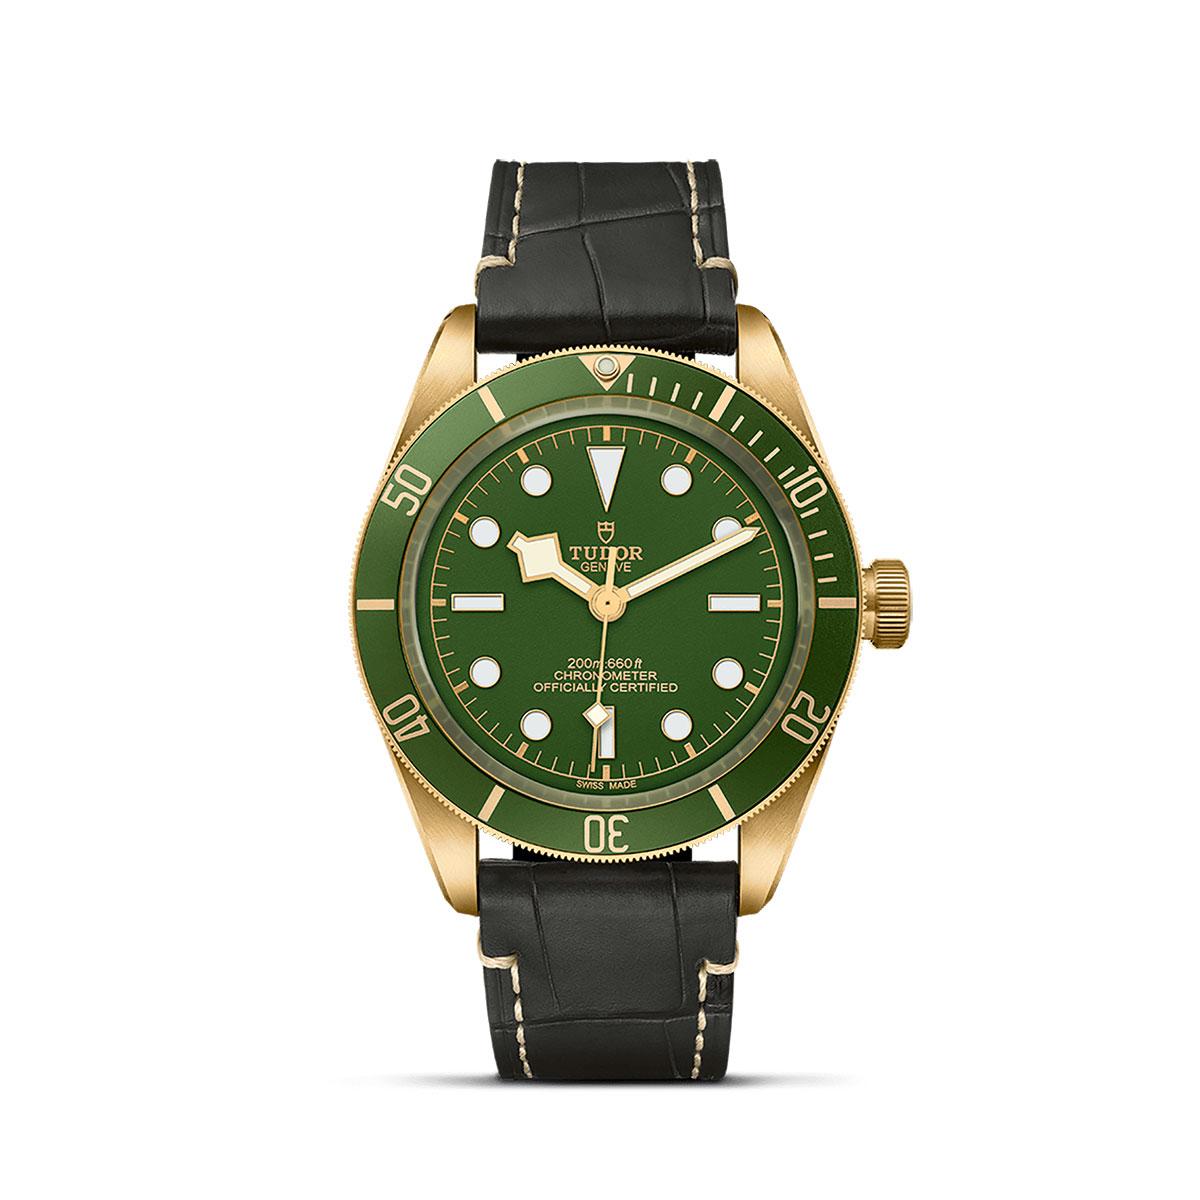 Tudor Black Bay Fifty-Eight 18K 39mm Watch